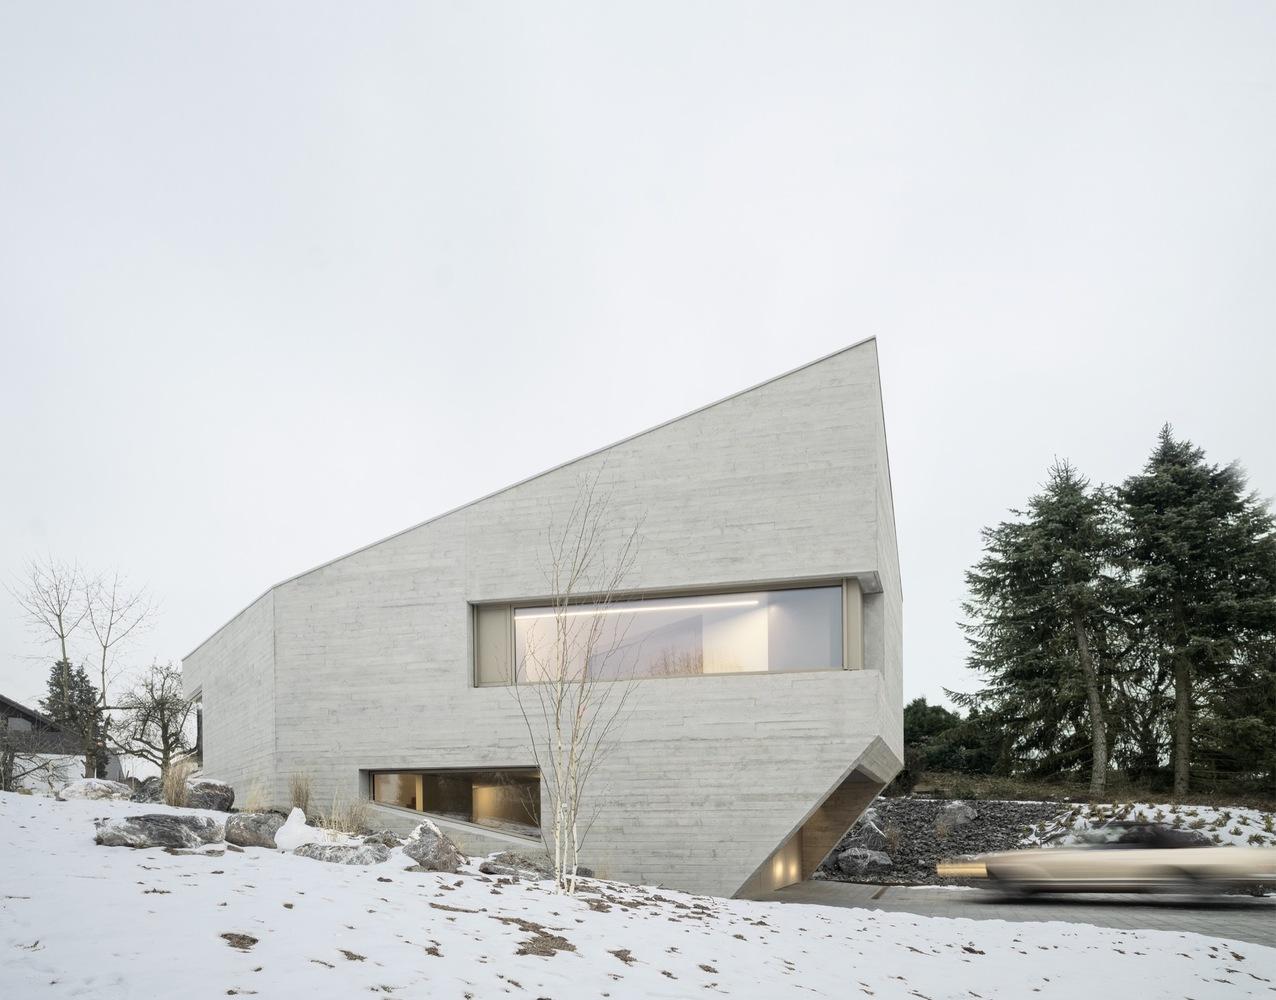 1_E20 Private Residence_STEIMLE ARCHITEKTEN BDA_Inspirationist